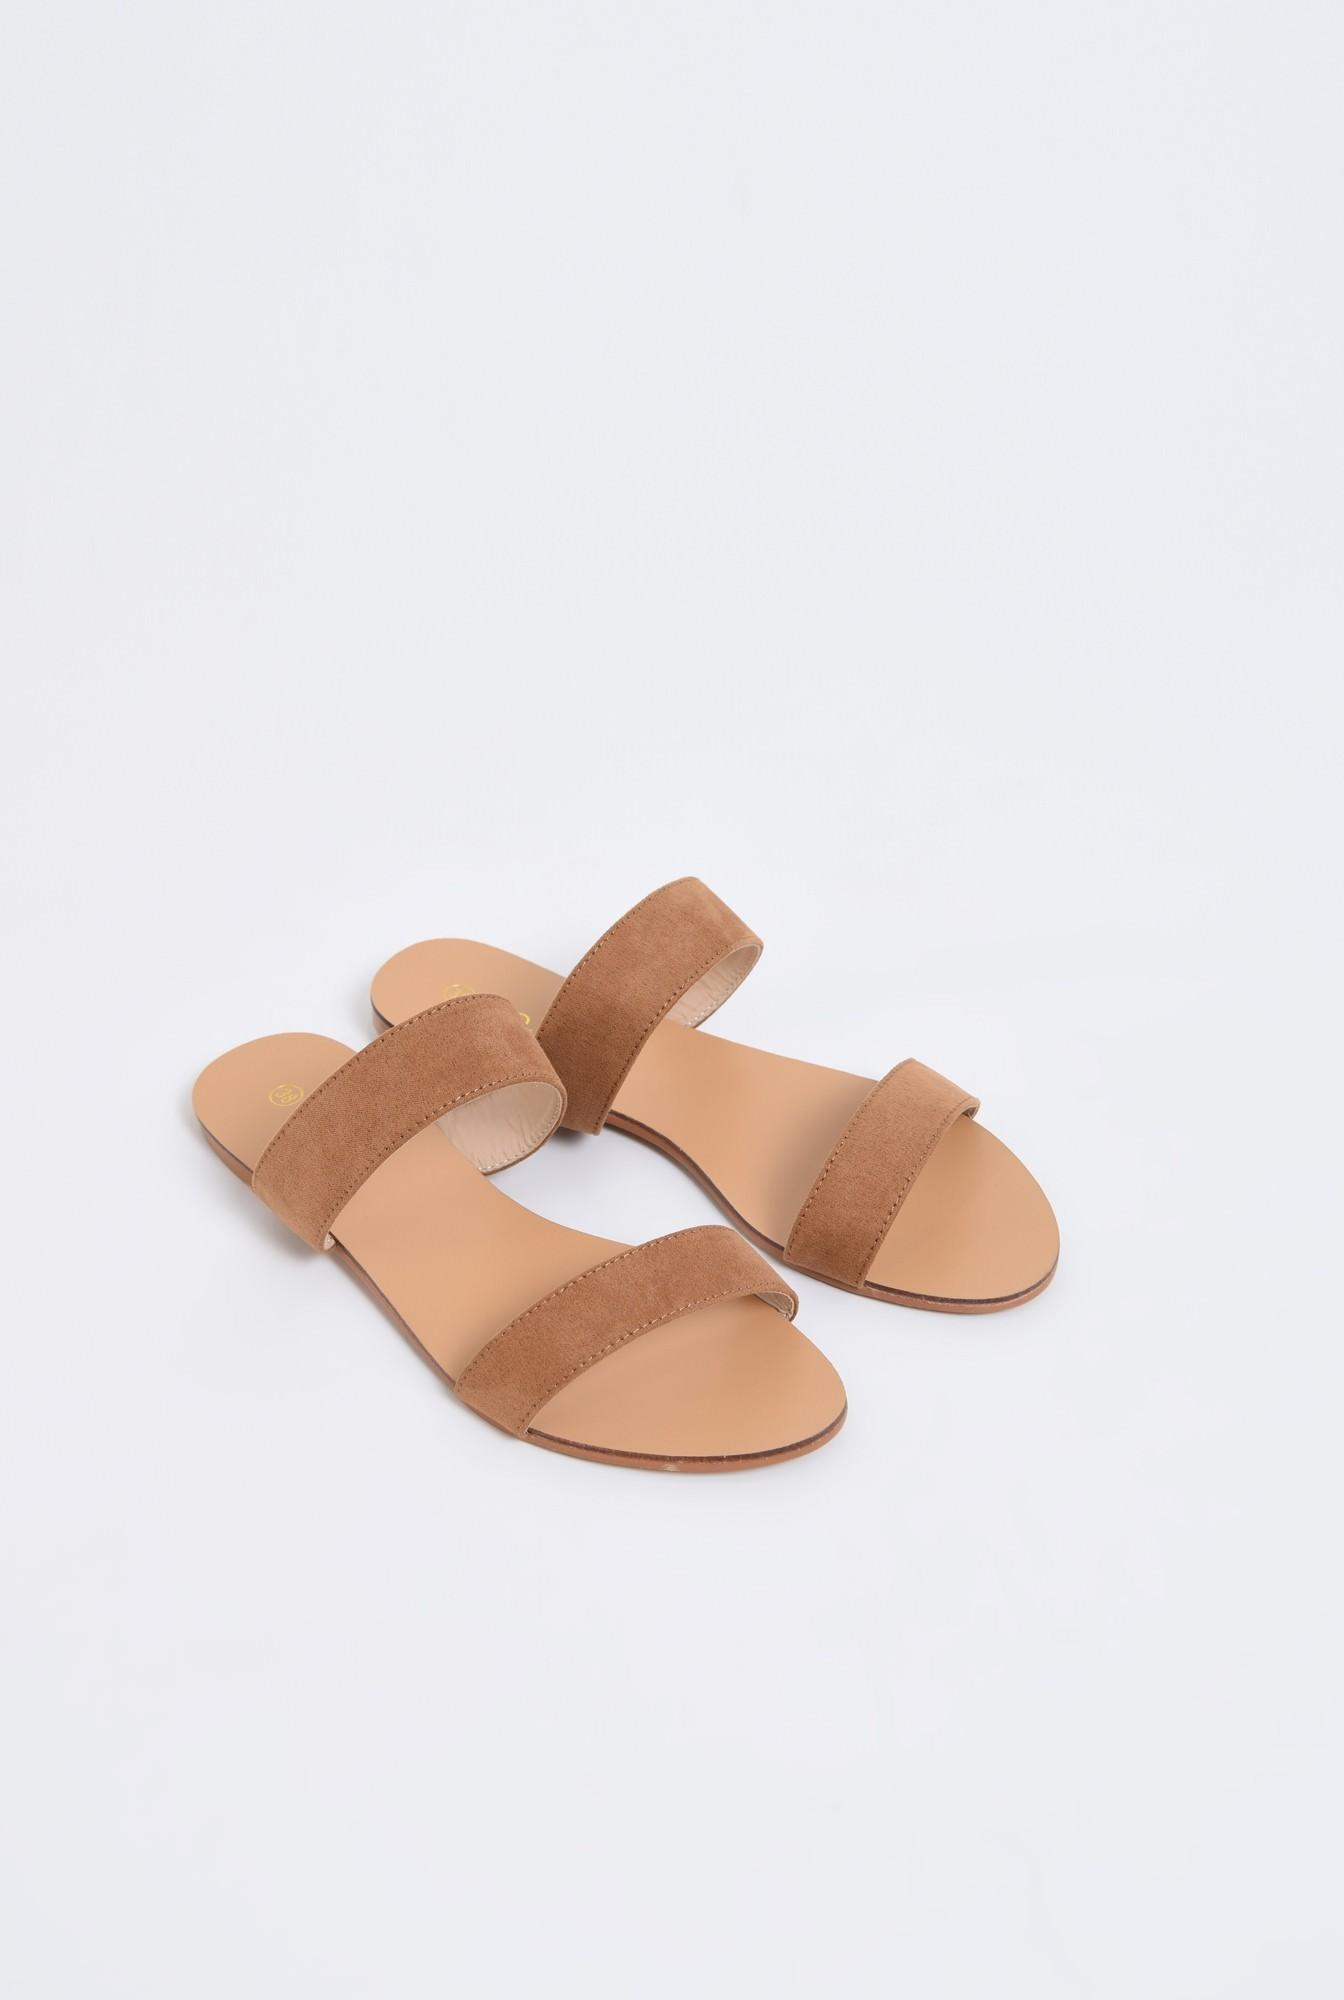 1 - papuci cu talpa joasa, velur, camel, barete late